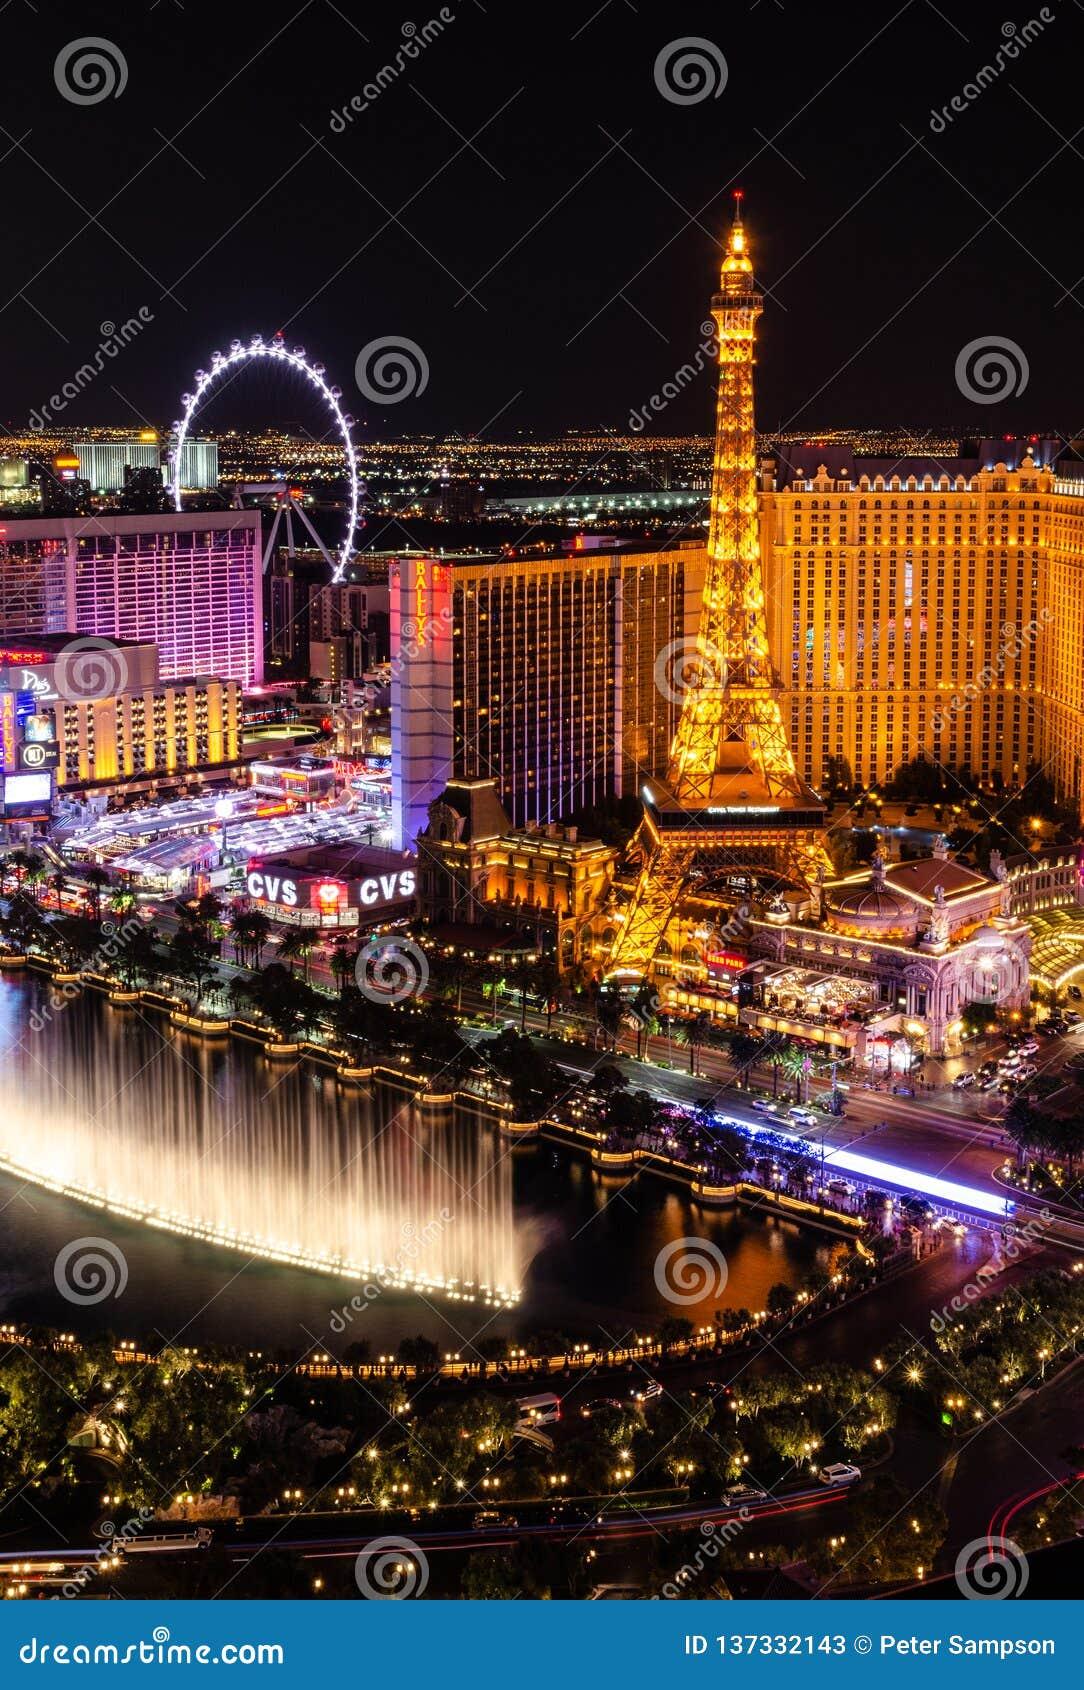 Fontes de Bellagio oposto a Paris Las Vegas na noite